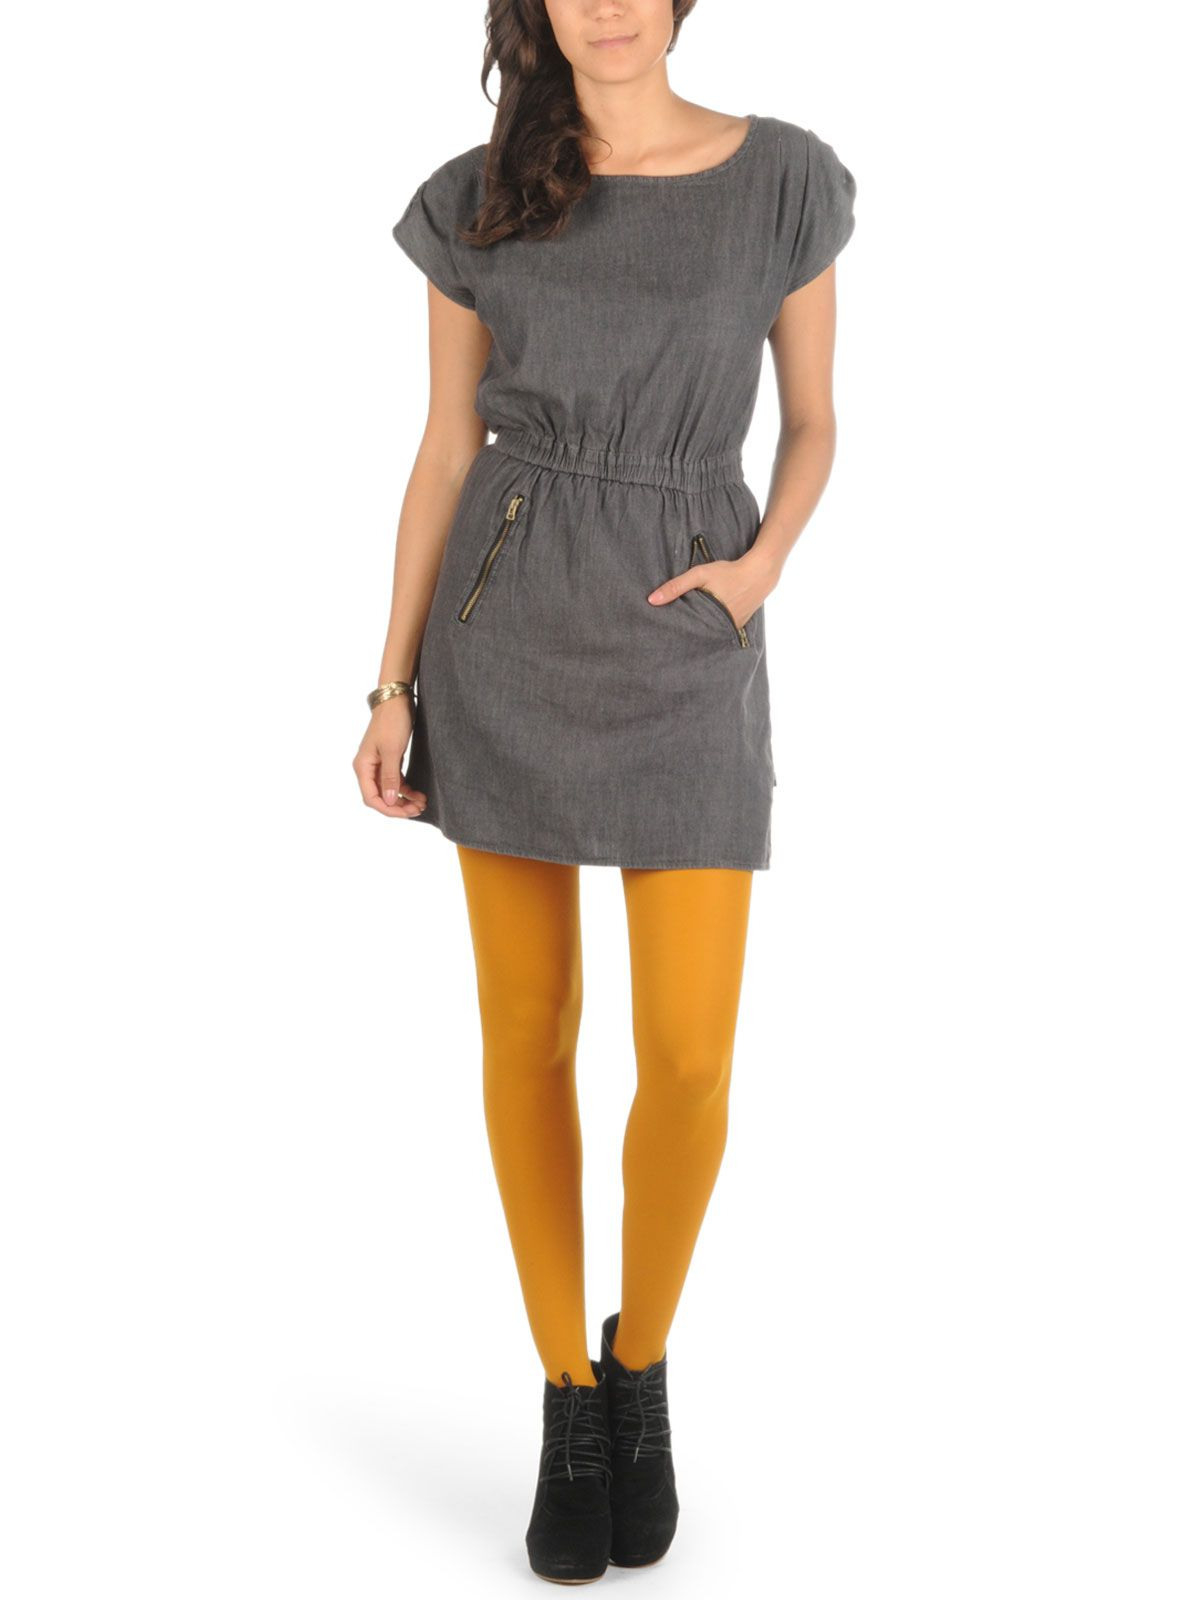 Ichi Hanna Kleid Park  Clothes Fashion Tshirt Dress